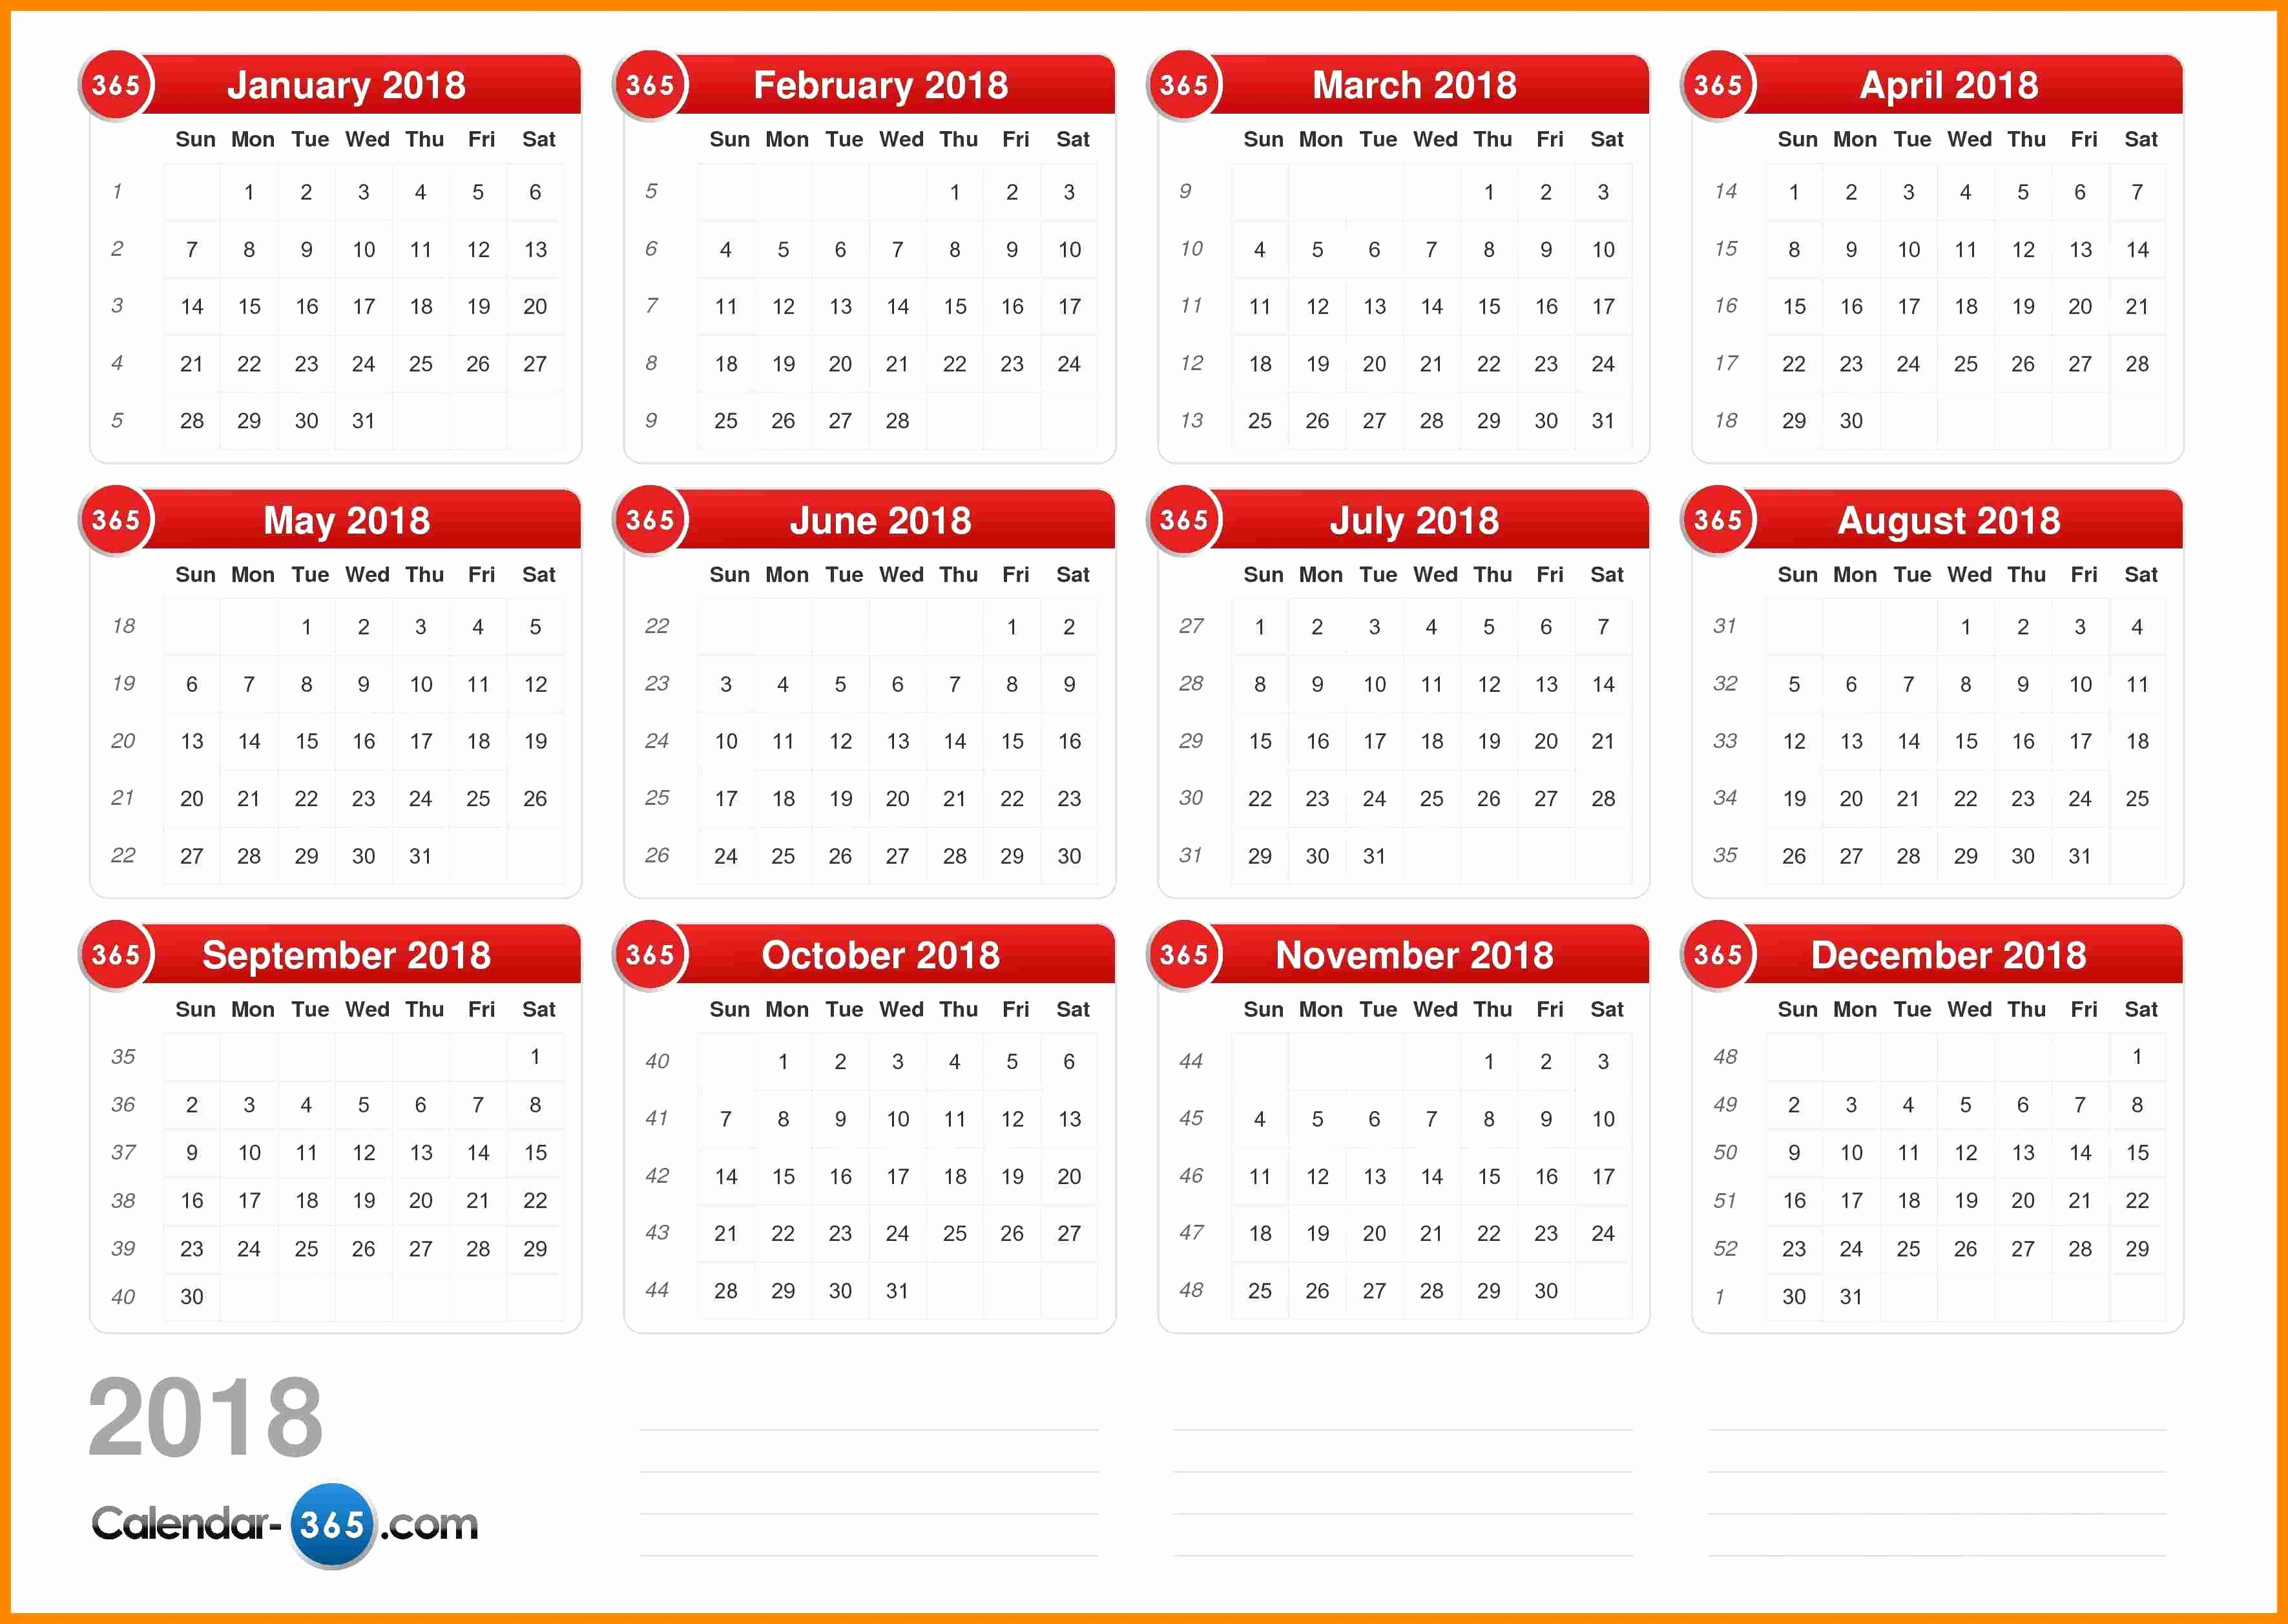 2019 Biweekly Payroll Calendar Excel Luxury Adp 2019 Payroll Calendar Semi Monthly